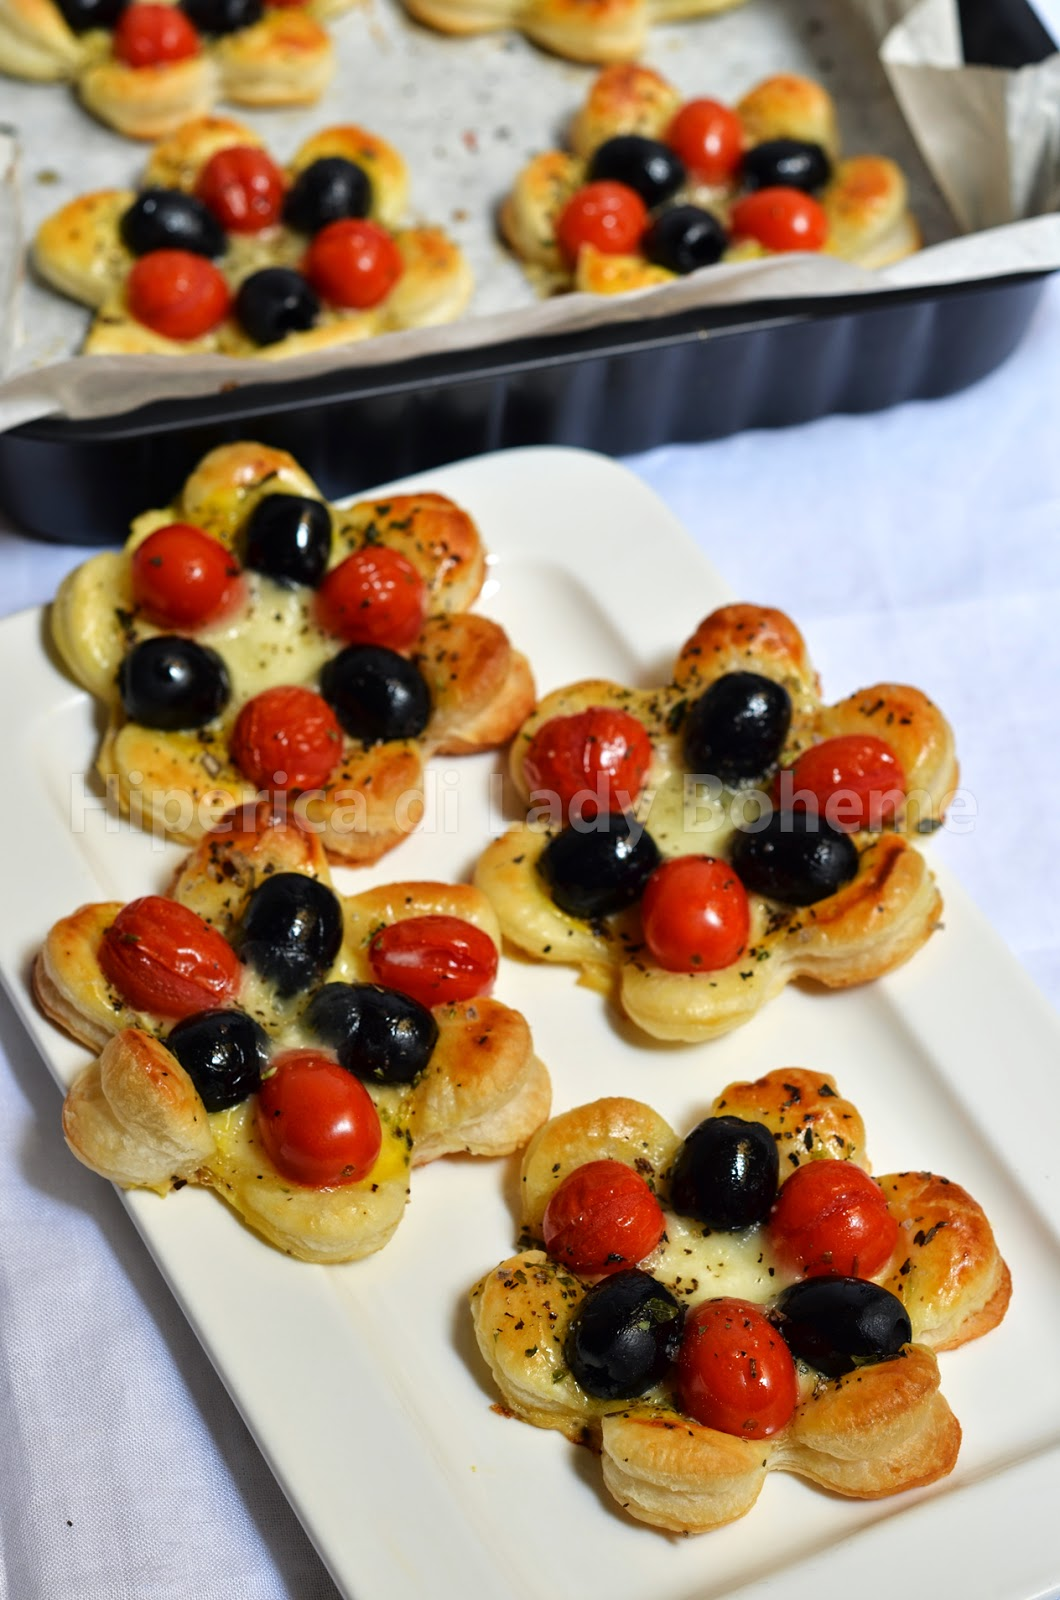 hiperica_lady_boheme_blog_cucina_ricette_gustose_facili_veloci_sfogliatine_salate_alle_olive_e_pomodorini_2